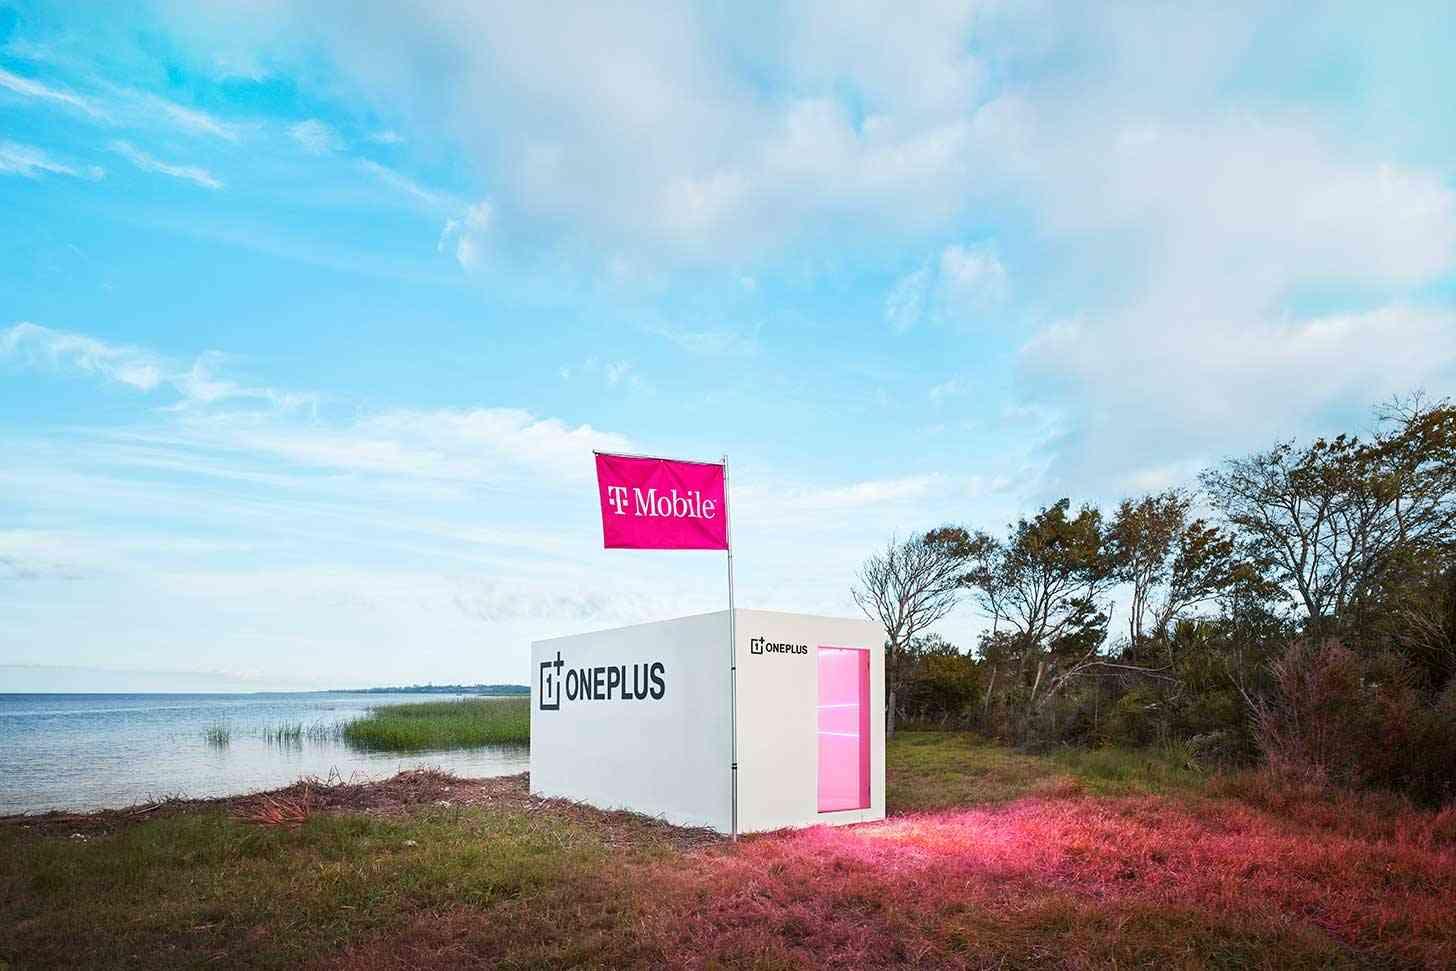 T-Mobile OnePlus virtual scavenger hunt